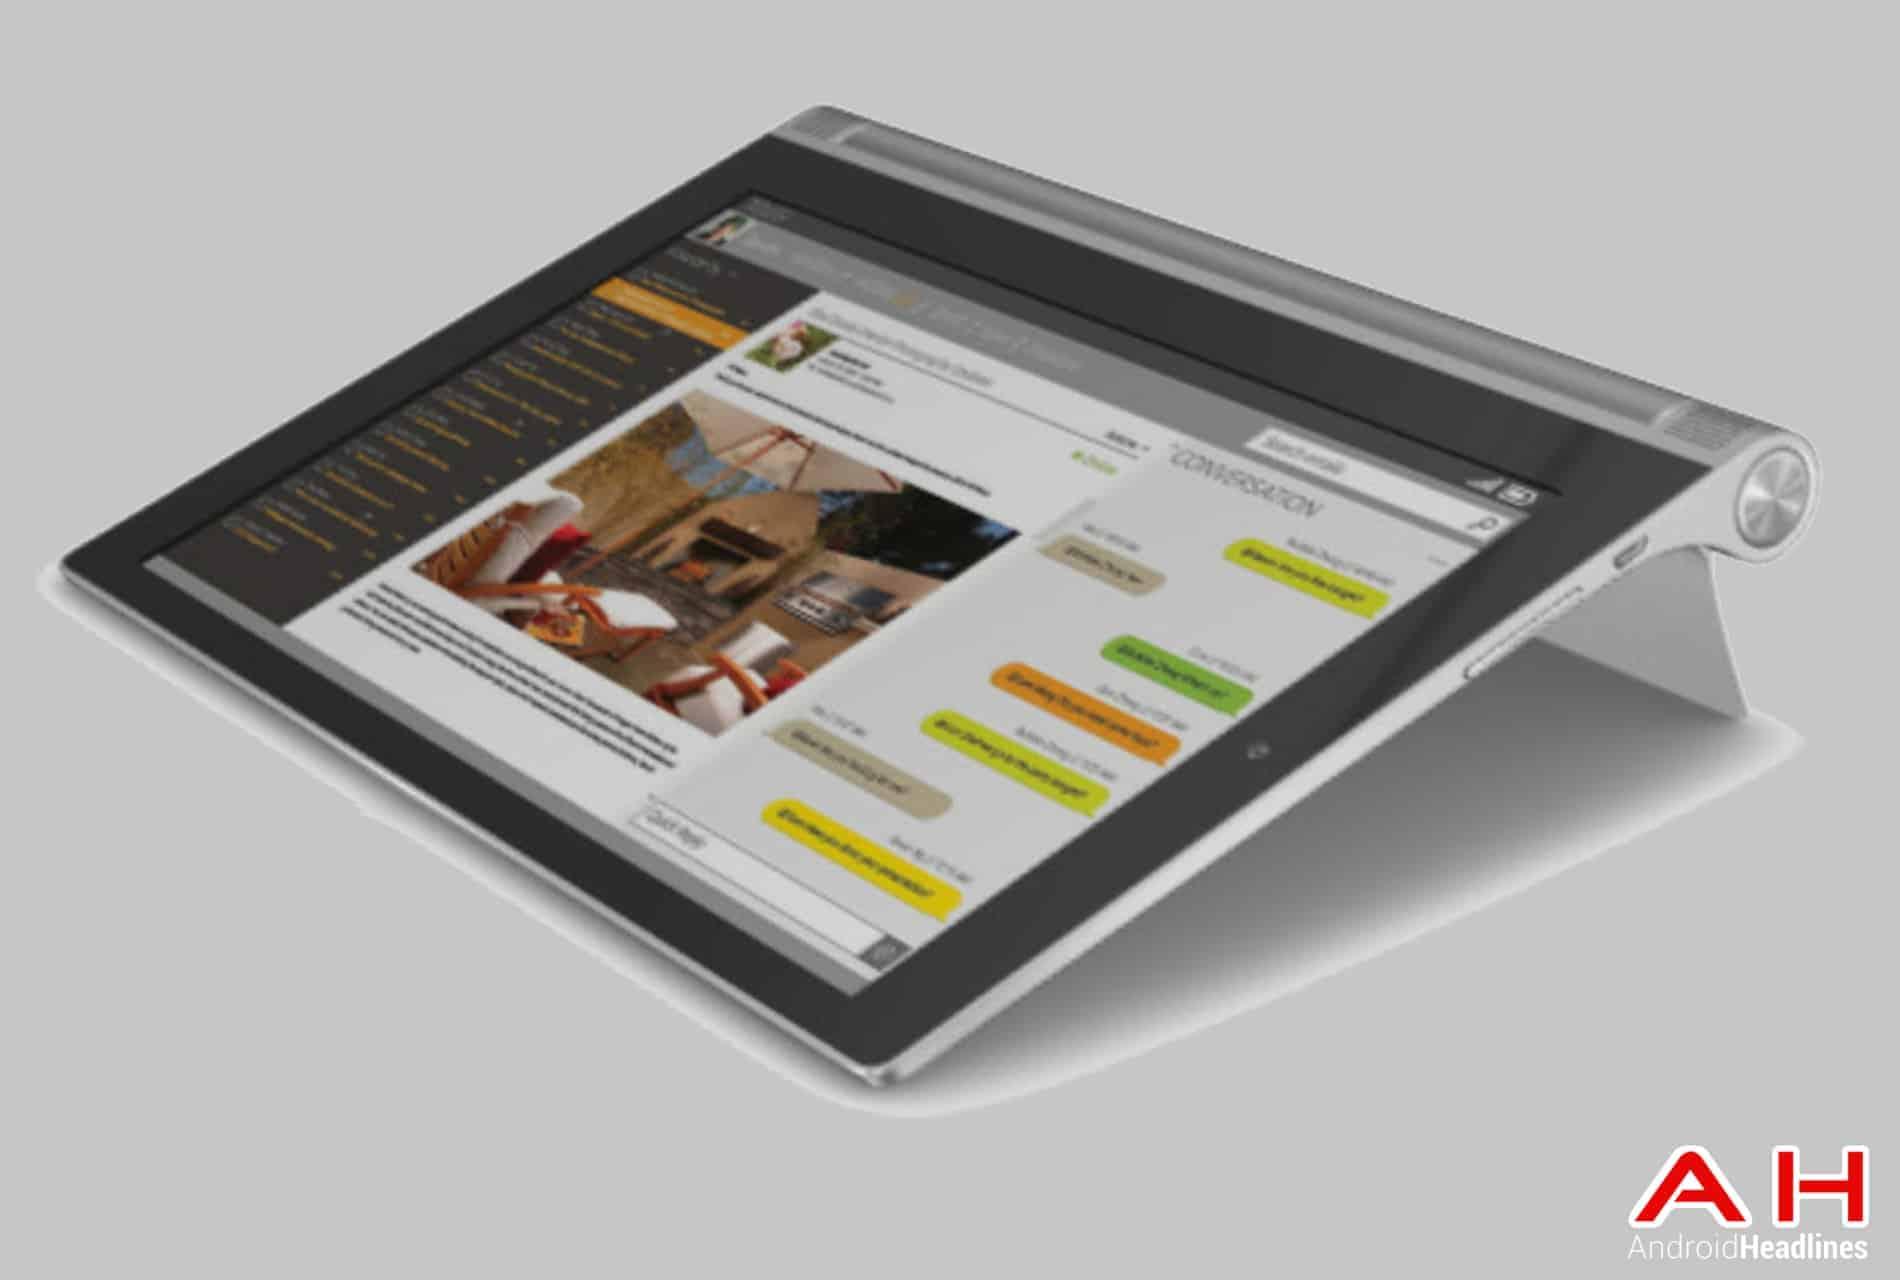 tablet comparisons nexus 9 vs lenovo yoga 2 10. Black Bedroom Furniture Sets. Home Design Ideas